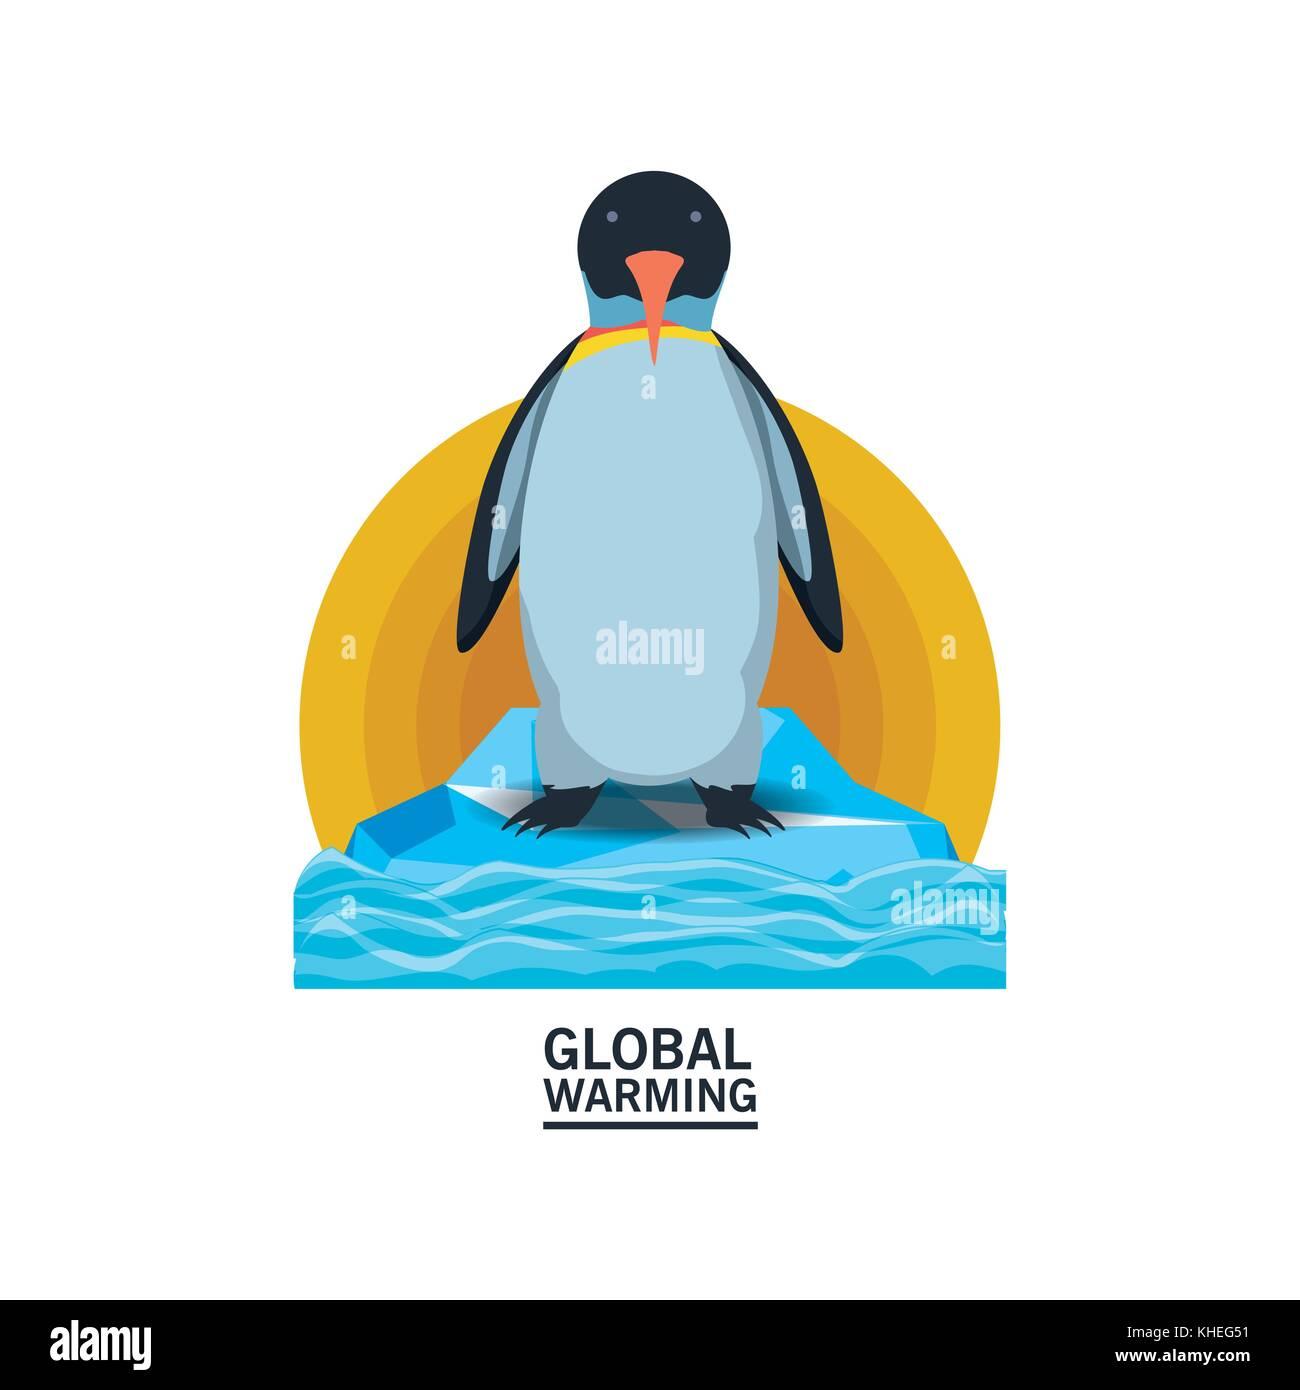 global warming design  - Stock Image